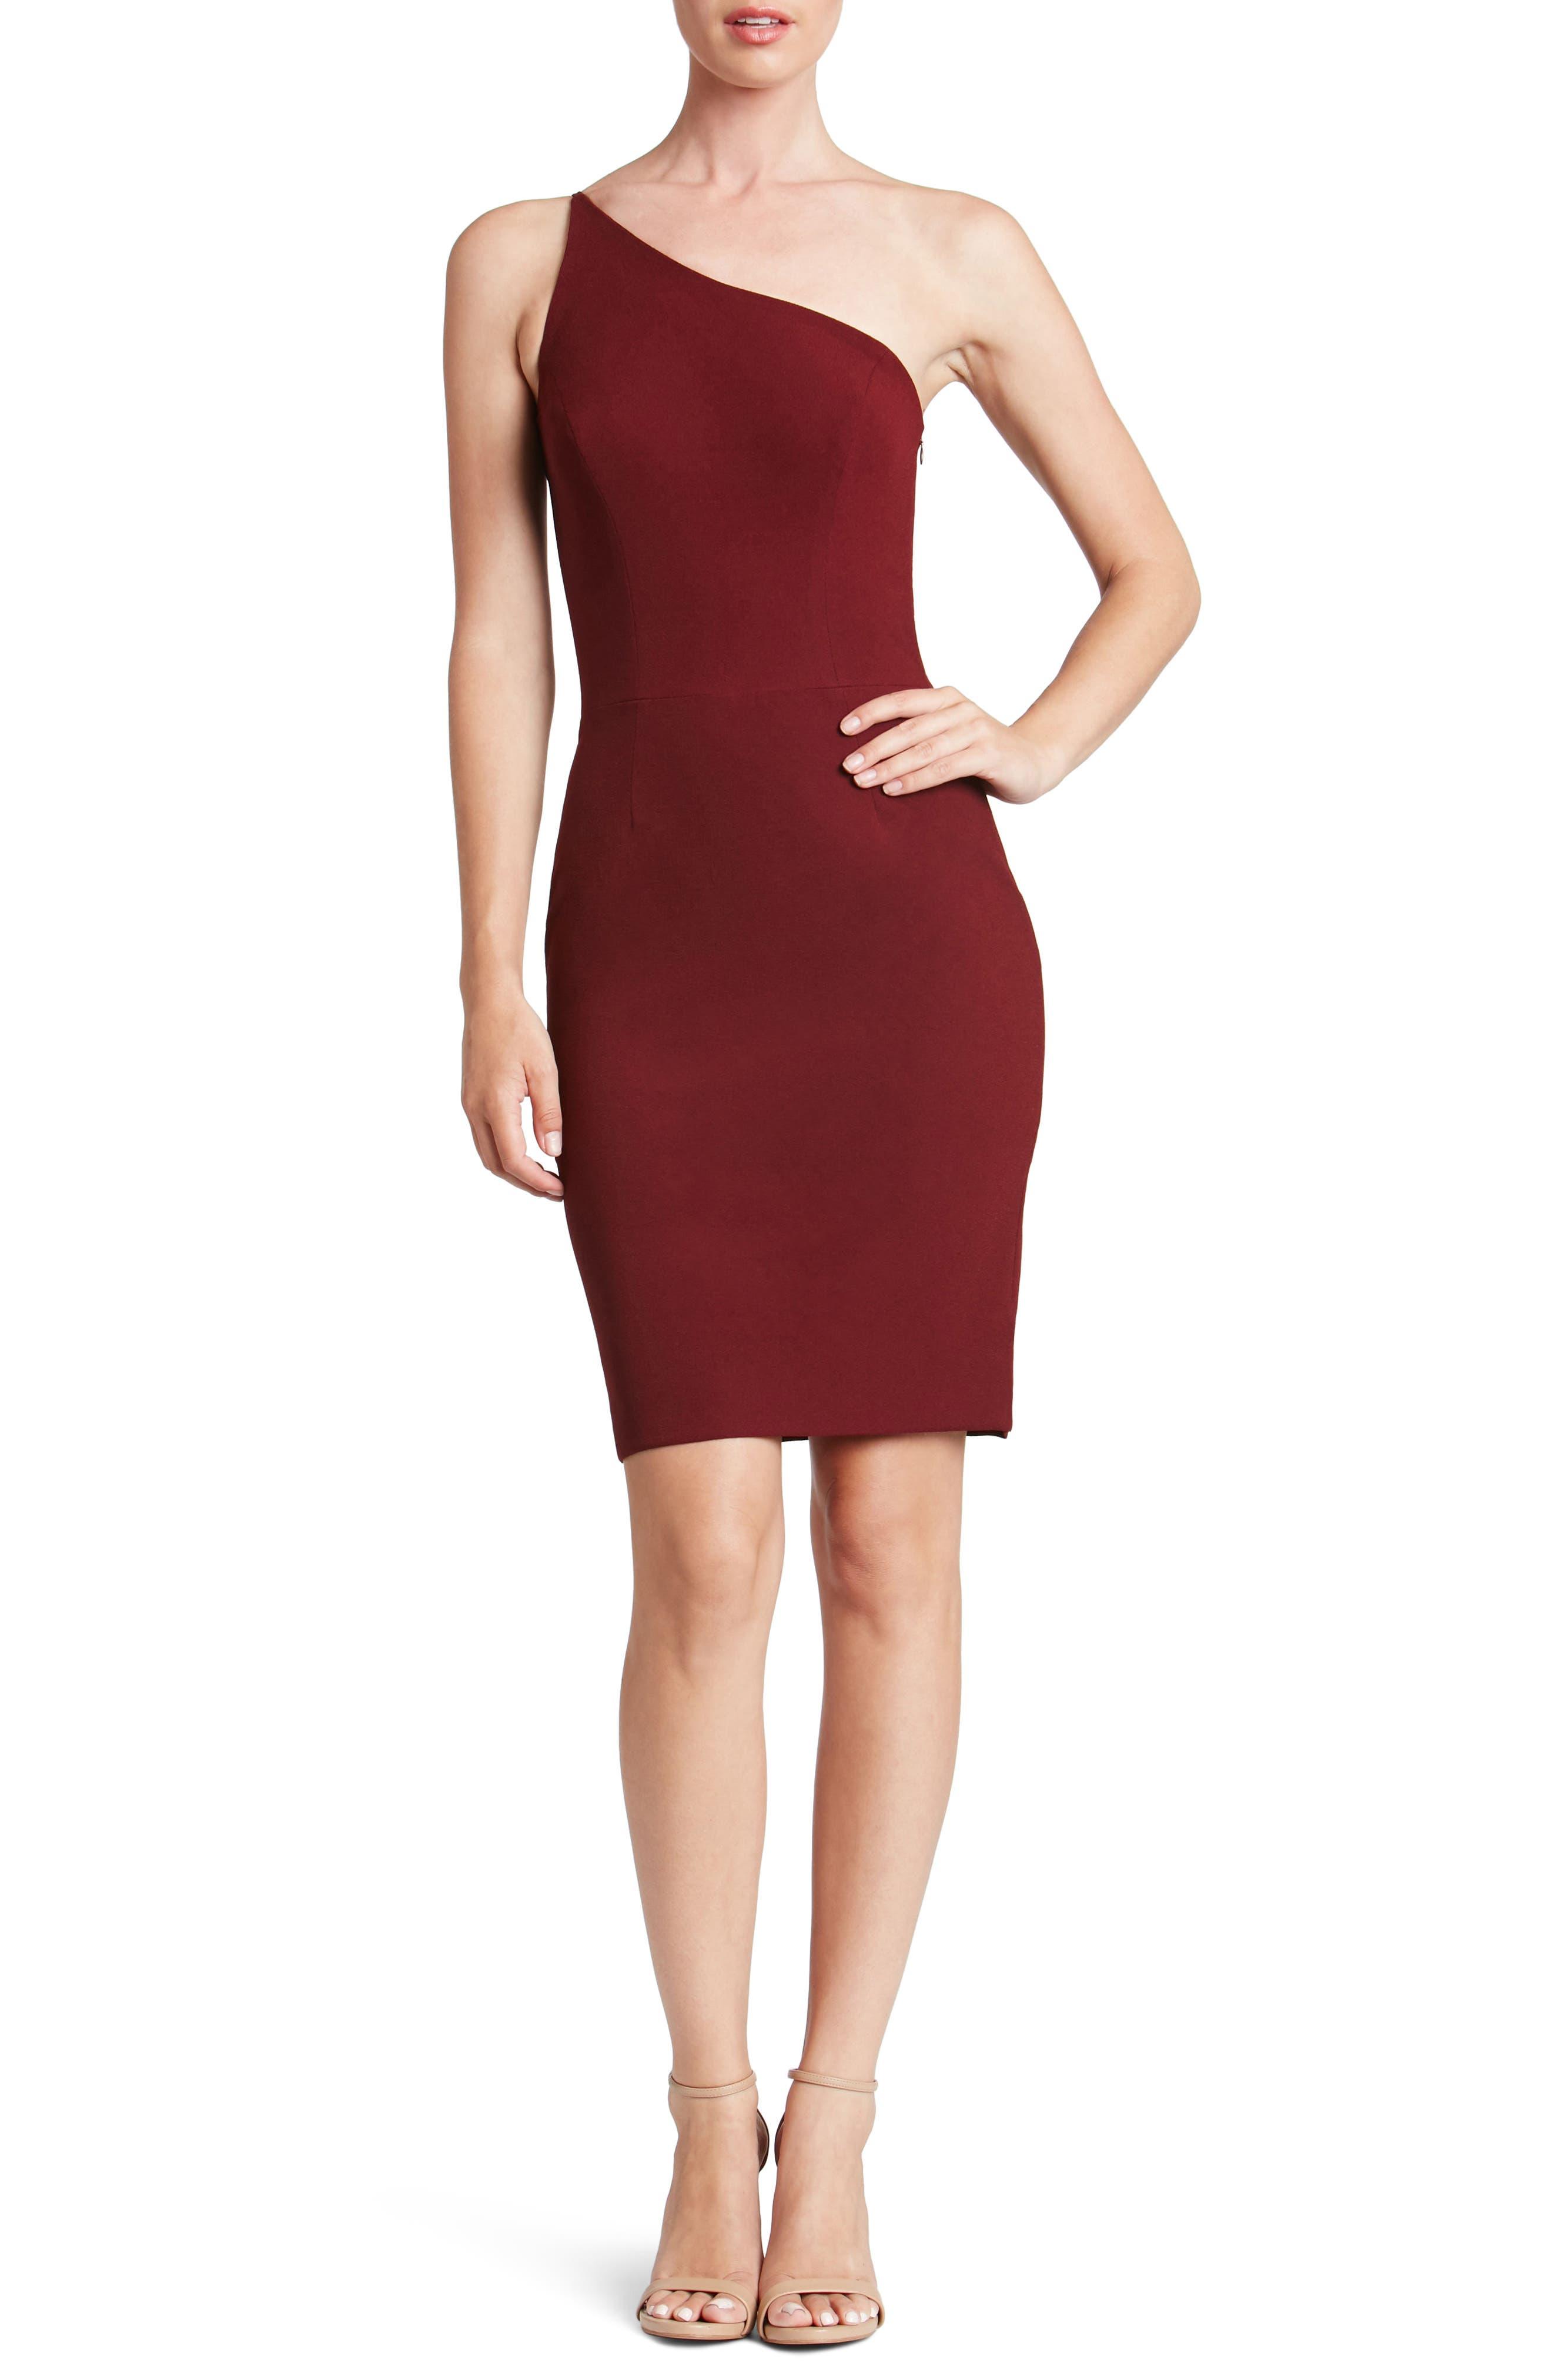 Jennifer One-Shoulder Body-Con Dress,                             Main thumbnail 2, color,